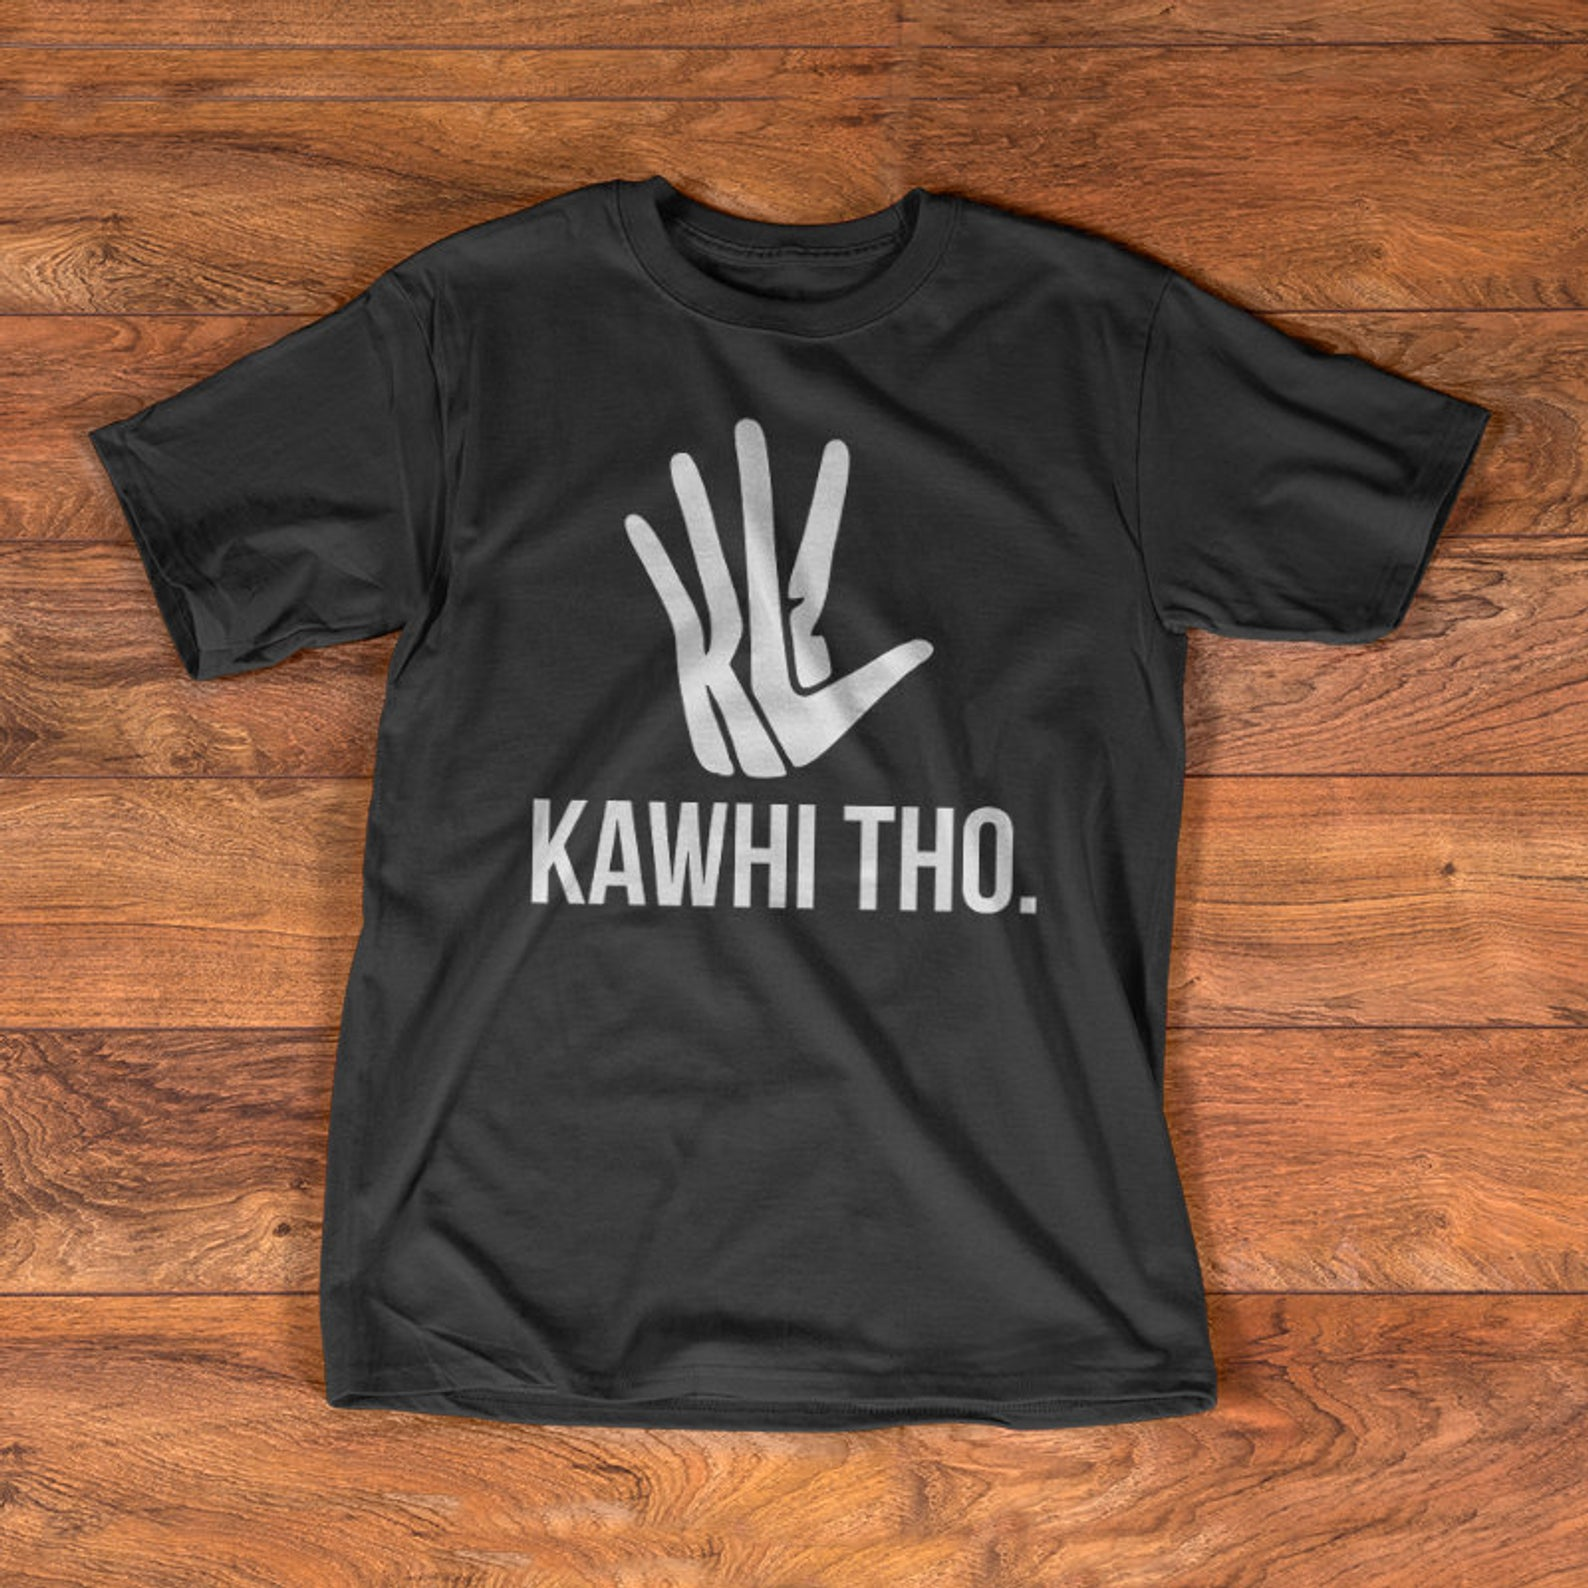 the latest 032e7 66775 Kawhi Leonard Unisex Jersey Short Sleeve Tee Toronto Raptors Kawhi Tho NBA  Champions 2019 Shirt